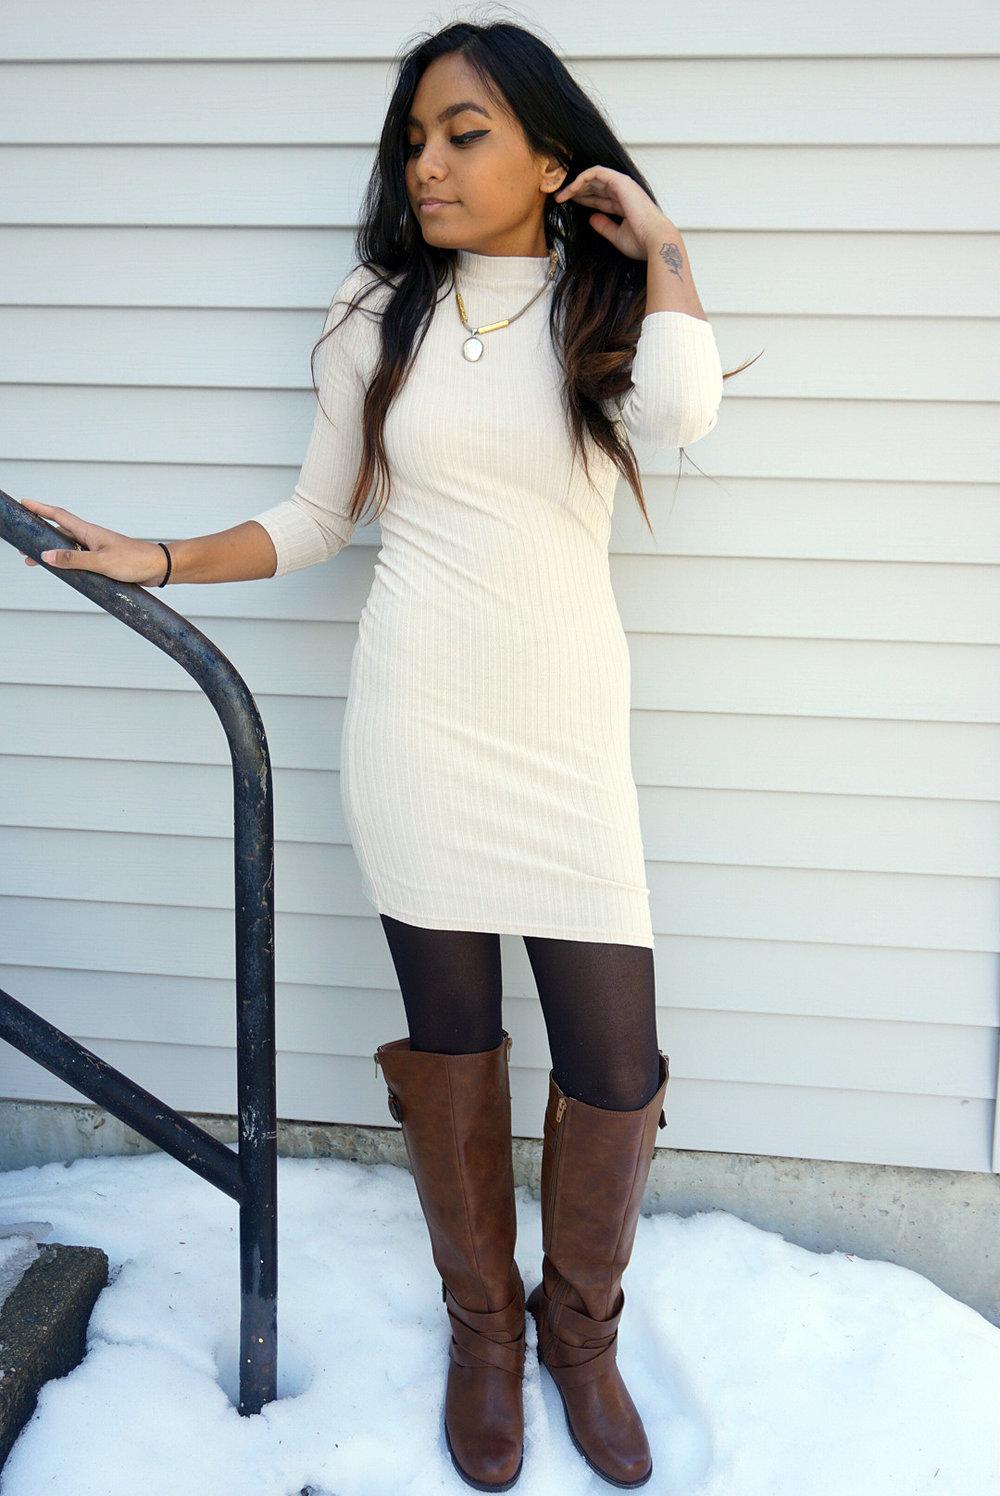 White-Dress-Caramel-Cardigan-Transitioning-To-Spring-Fashionista-Blogger-Style-LINDATENCHITRAN-10-1080x1616.jpg